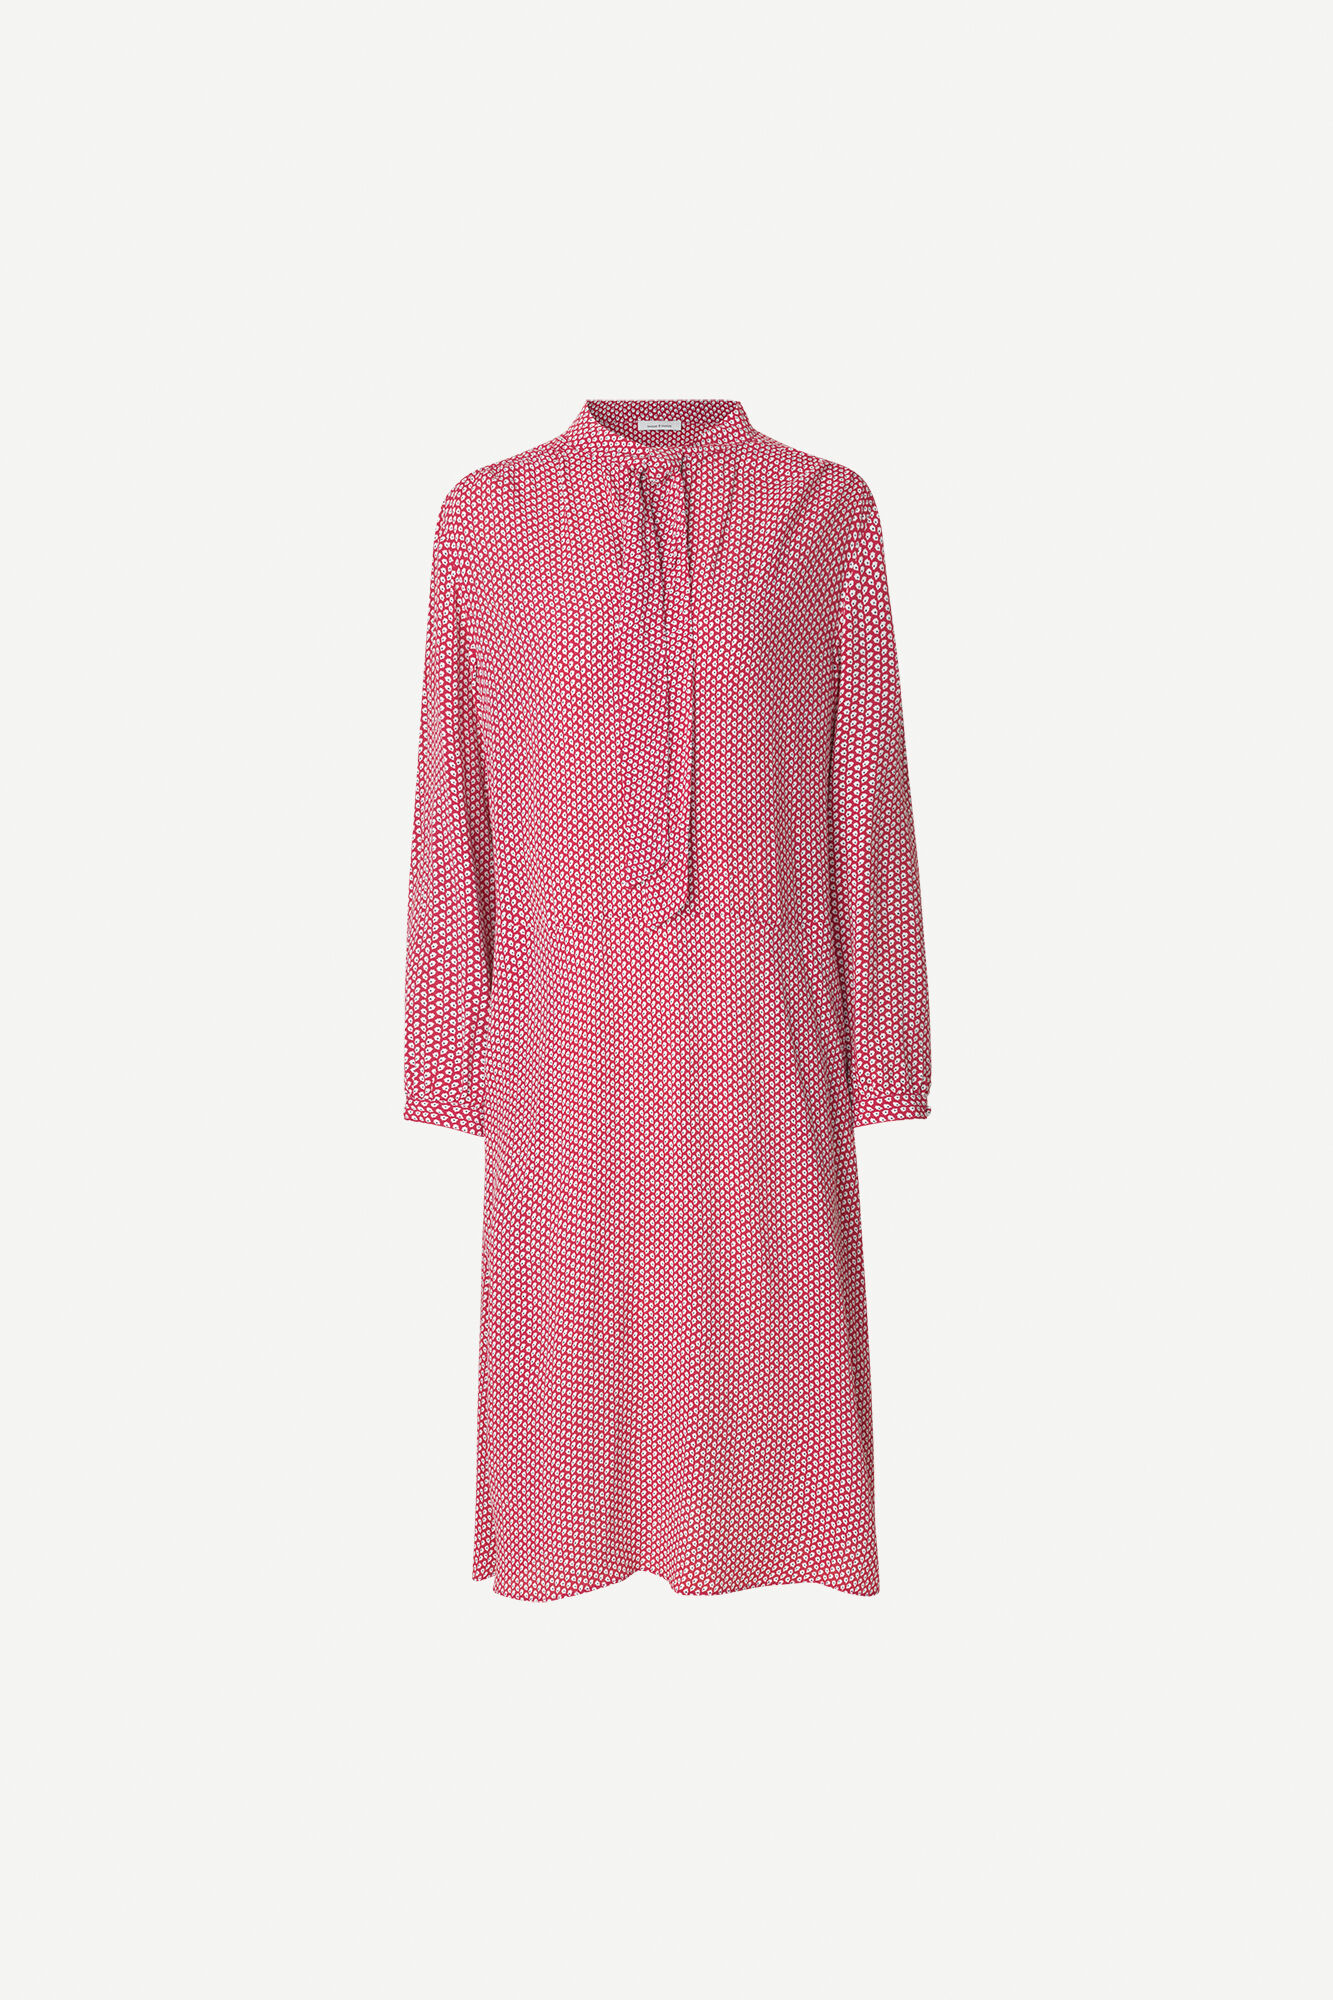 Merrit dress aop 10867